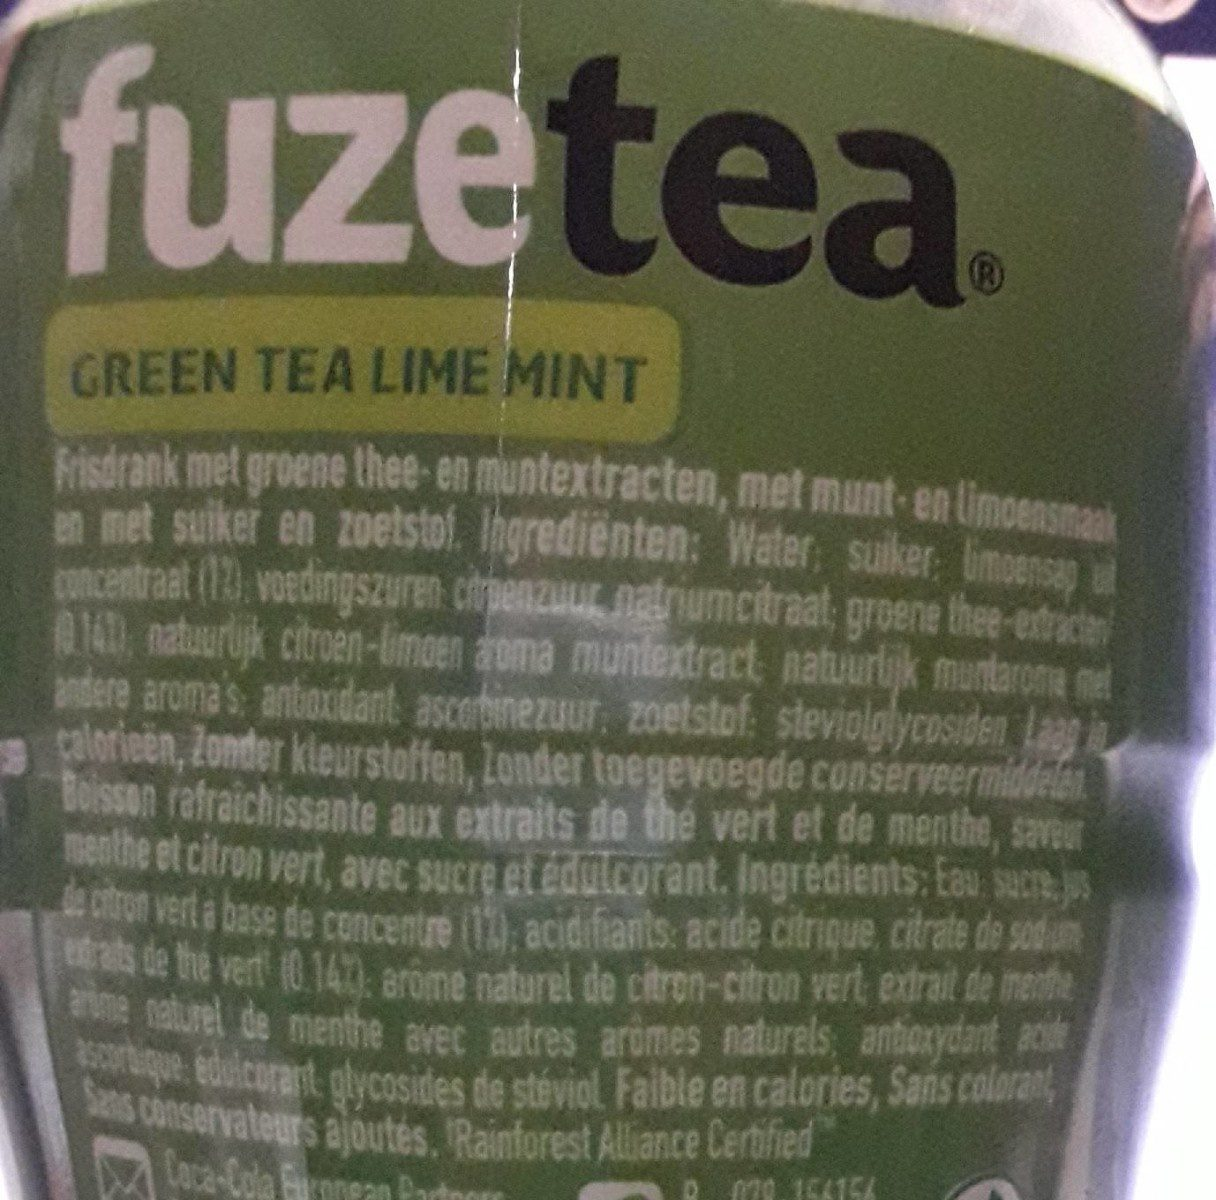 FuzeTea green tea lime mint - Ingrédients